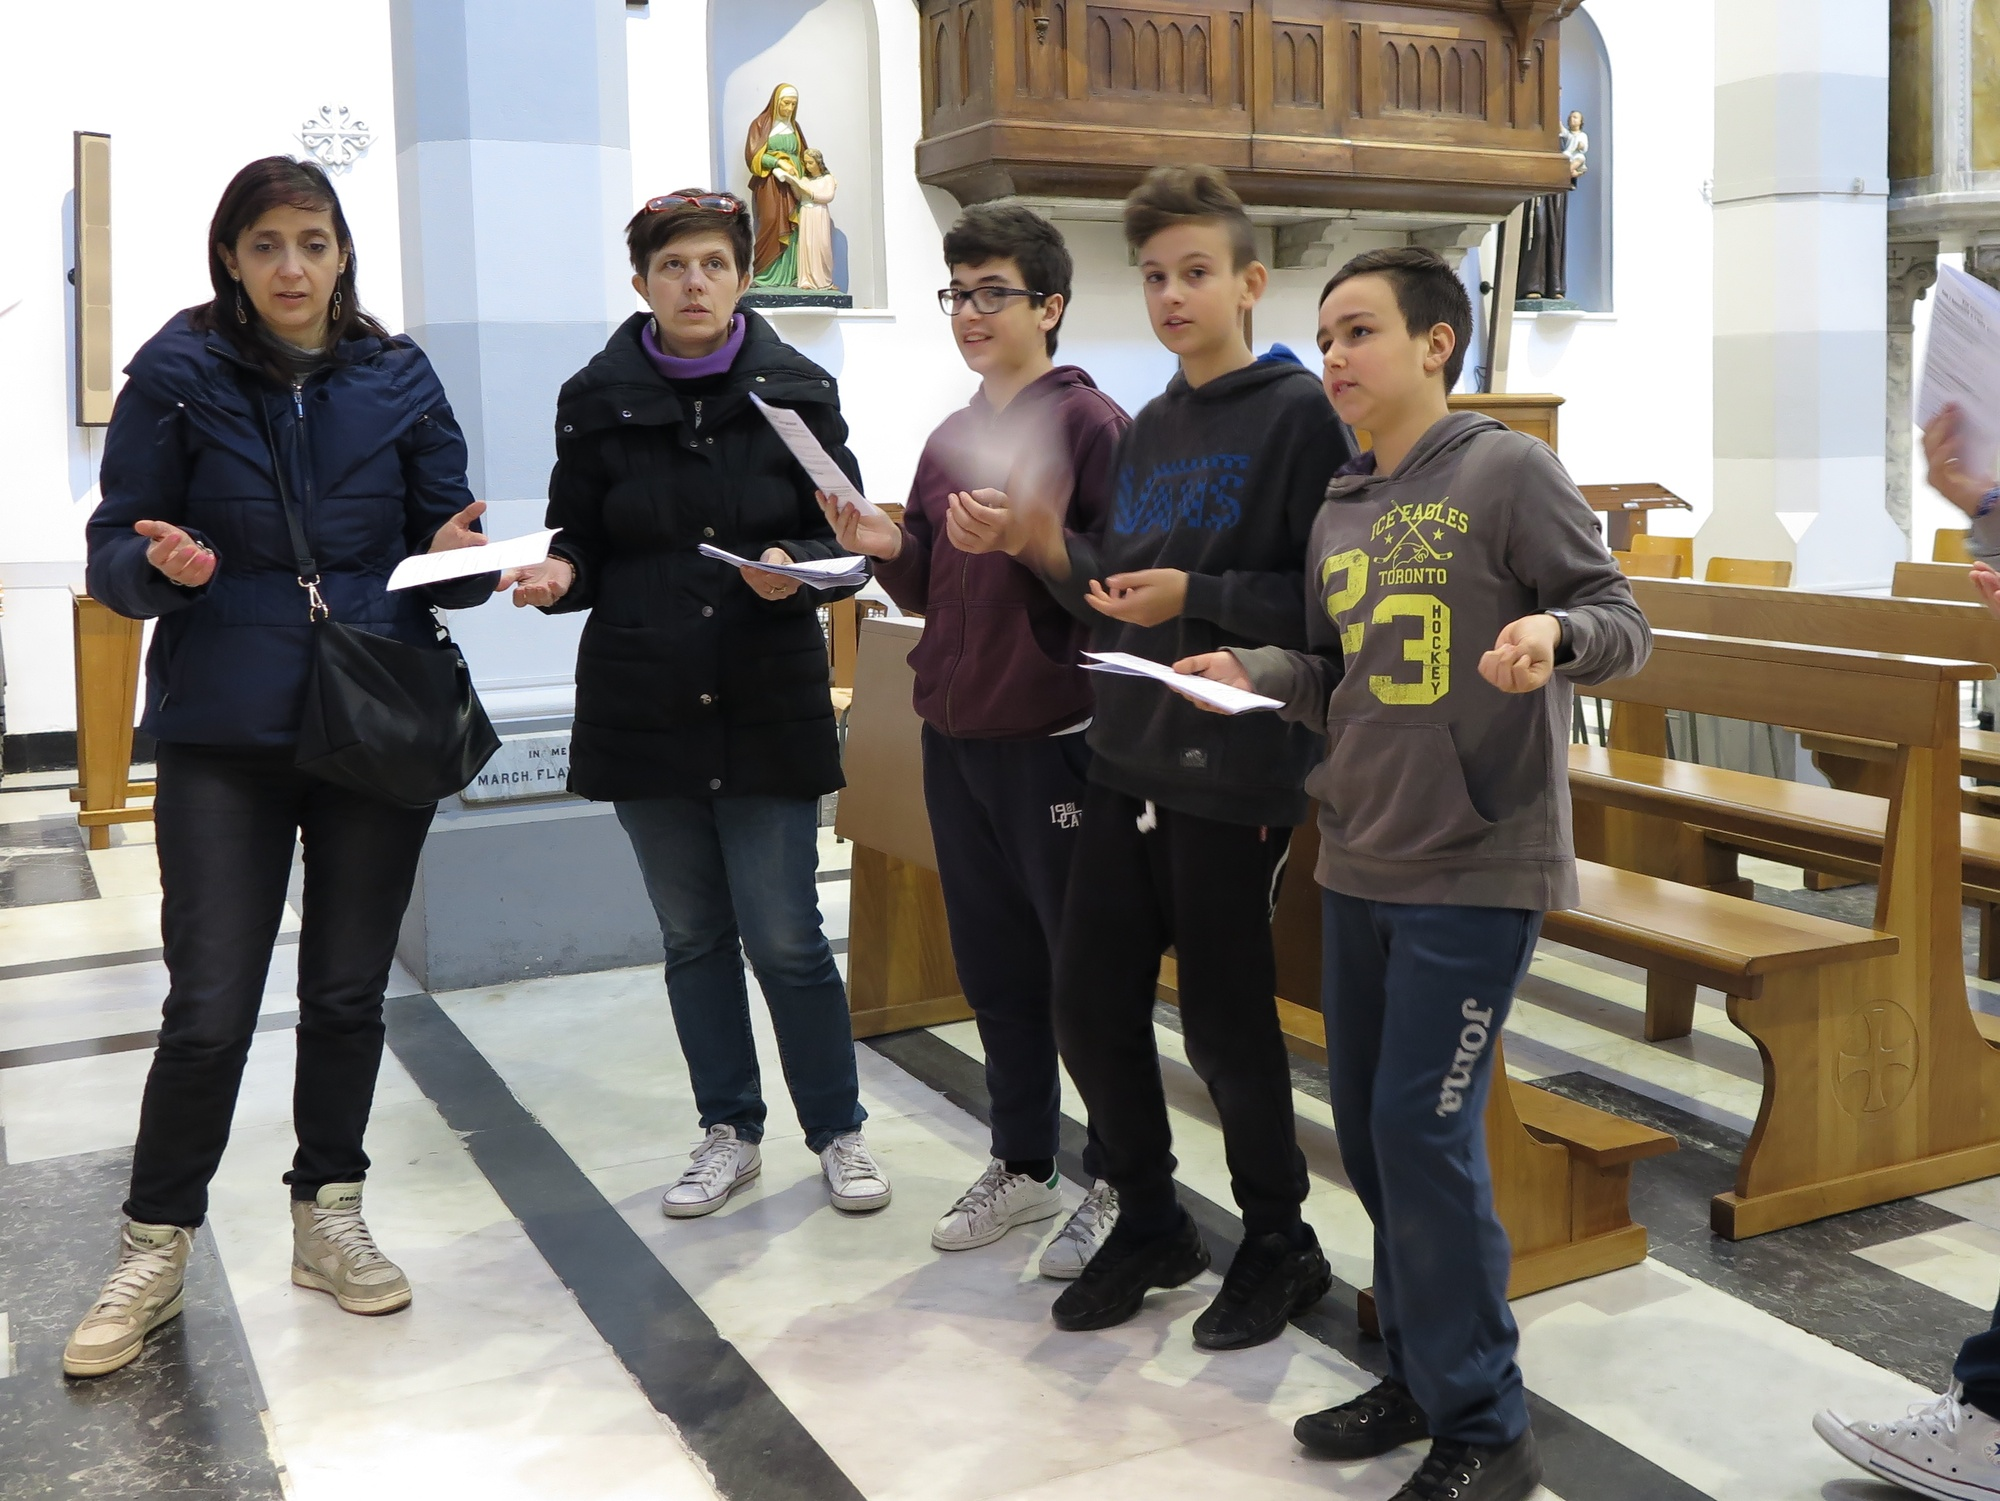 via-crucis-catechismo-2016-03-18-15-34-13